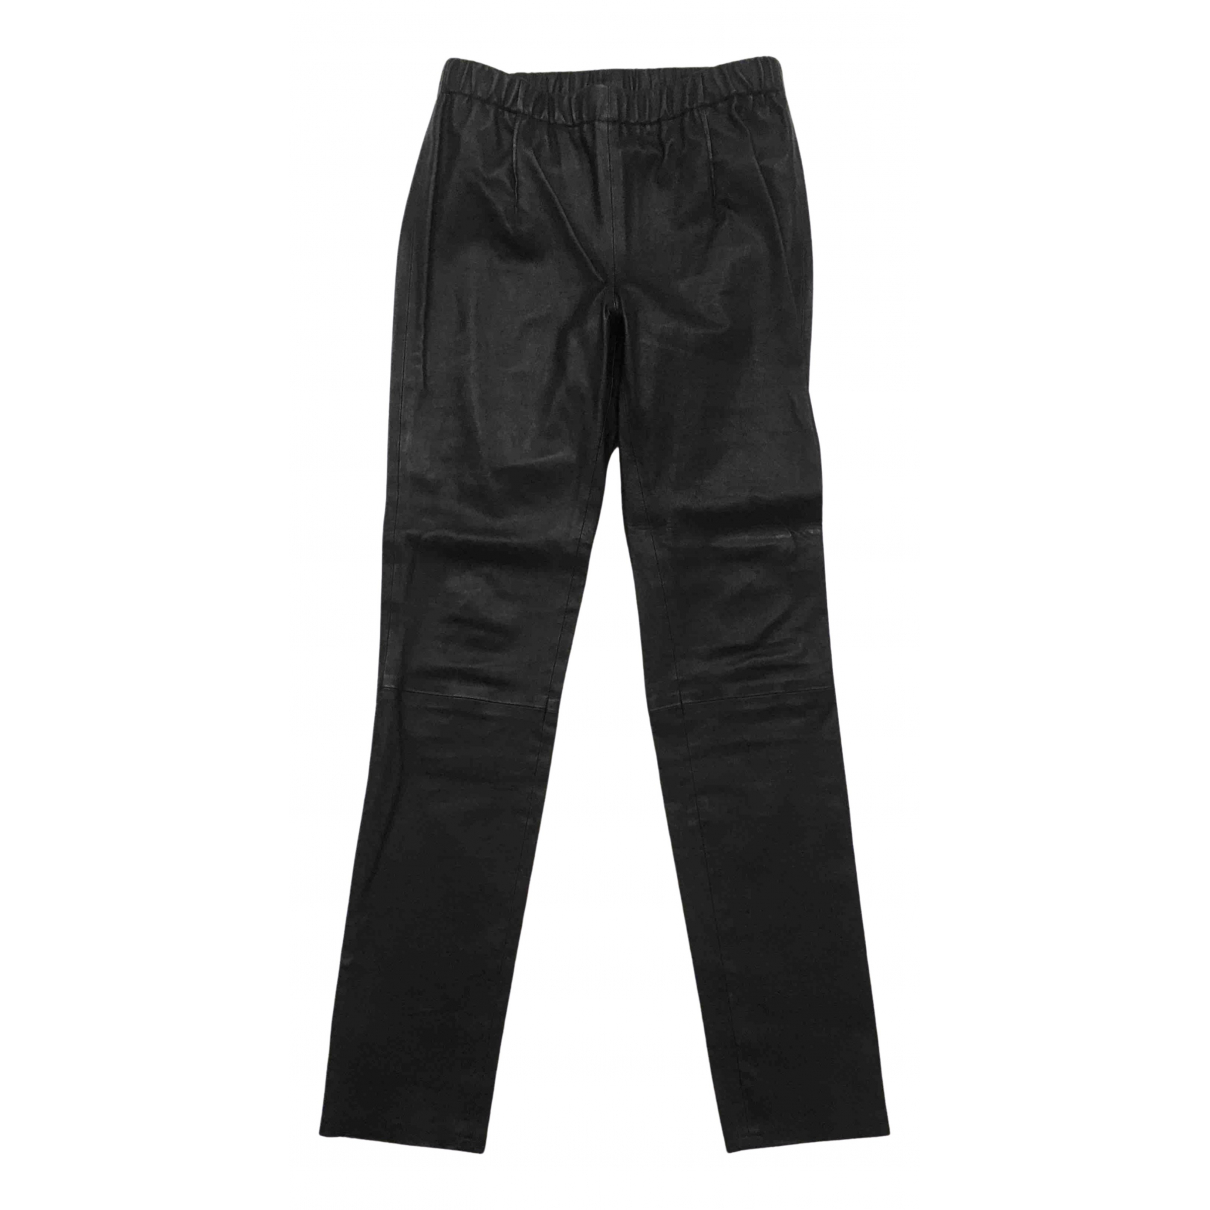 Baukjen \N Black Leather Trousers for Women 12 UK